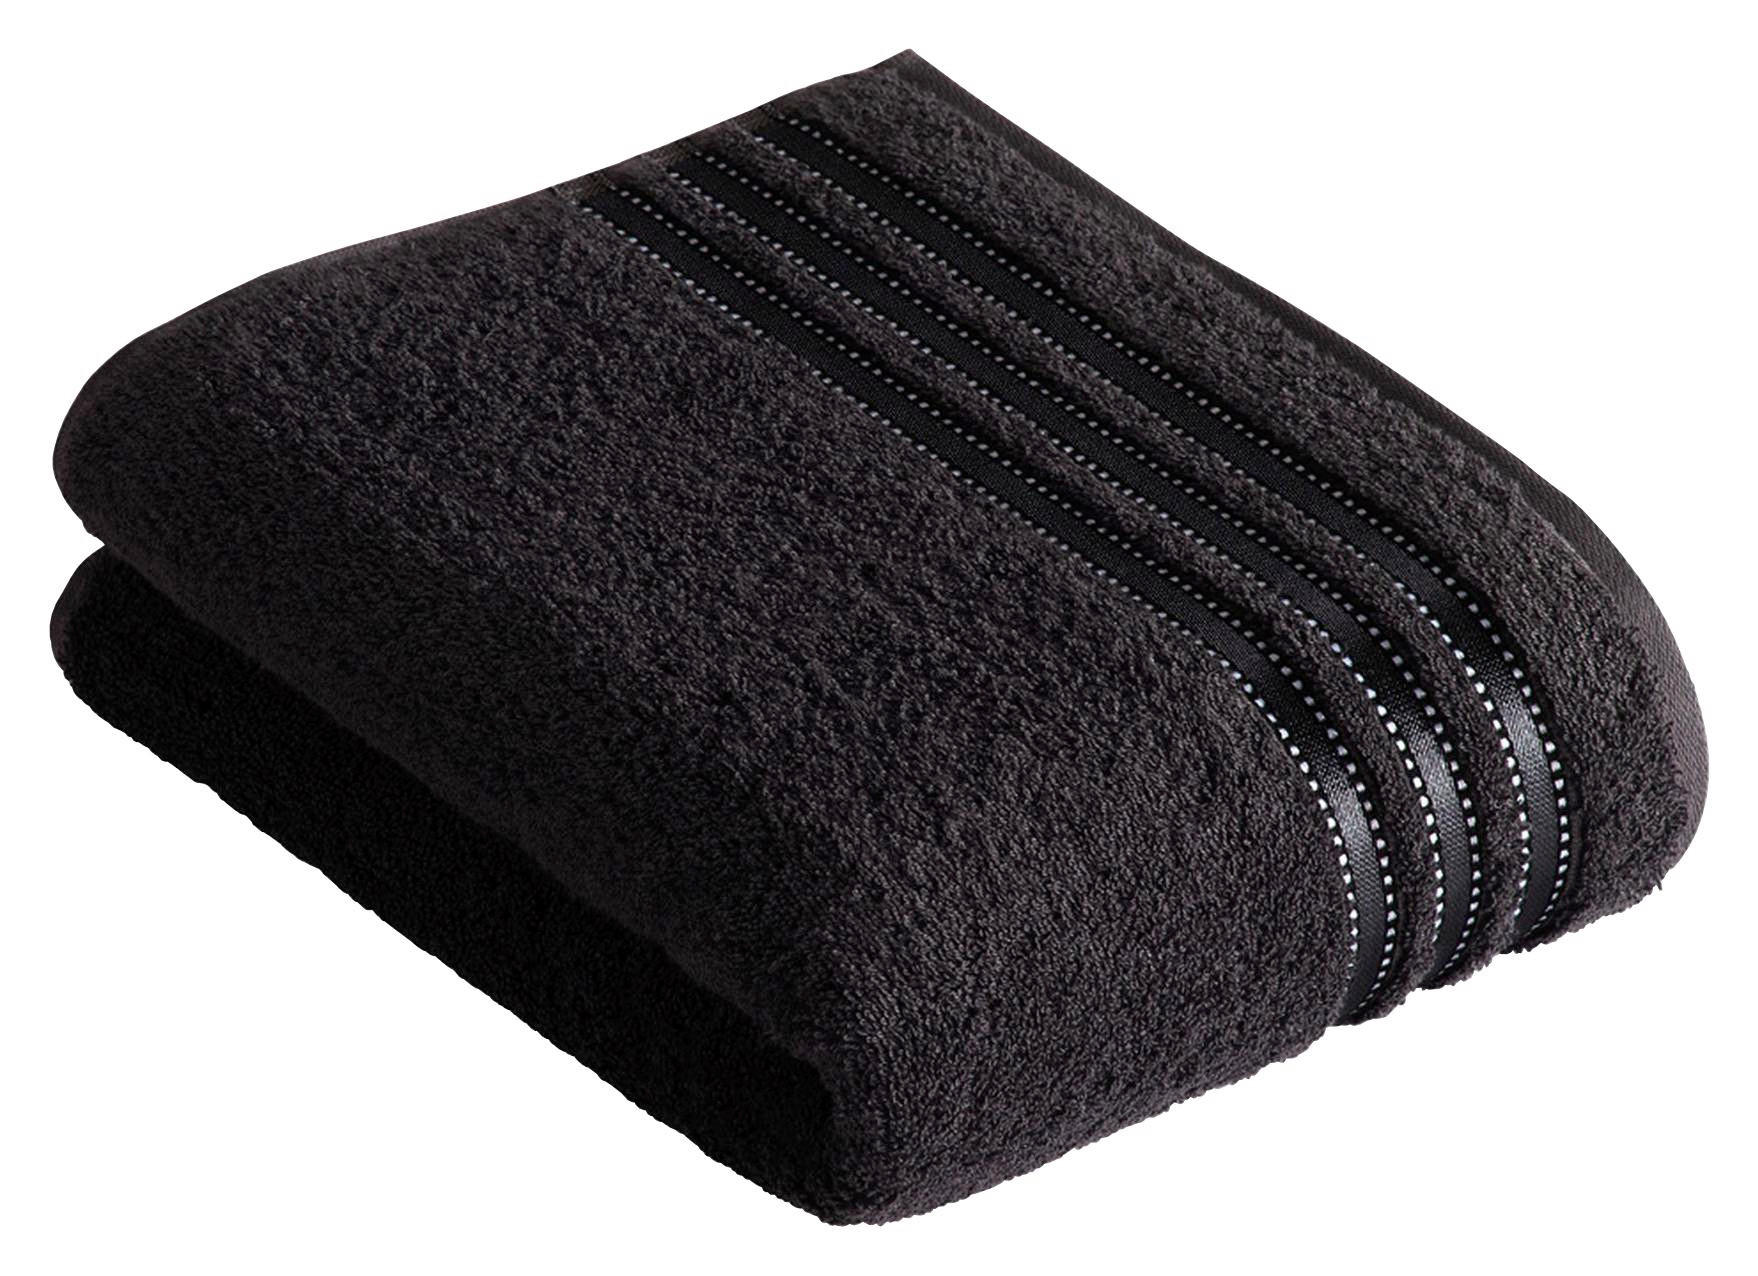 RUČNIK ZA TUŠIRANJE - crna, Konvencionalno, tekstil (67/140cm) - VOSSEN